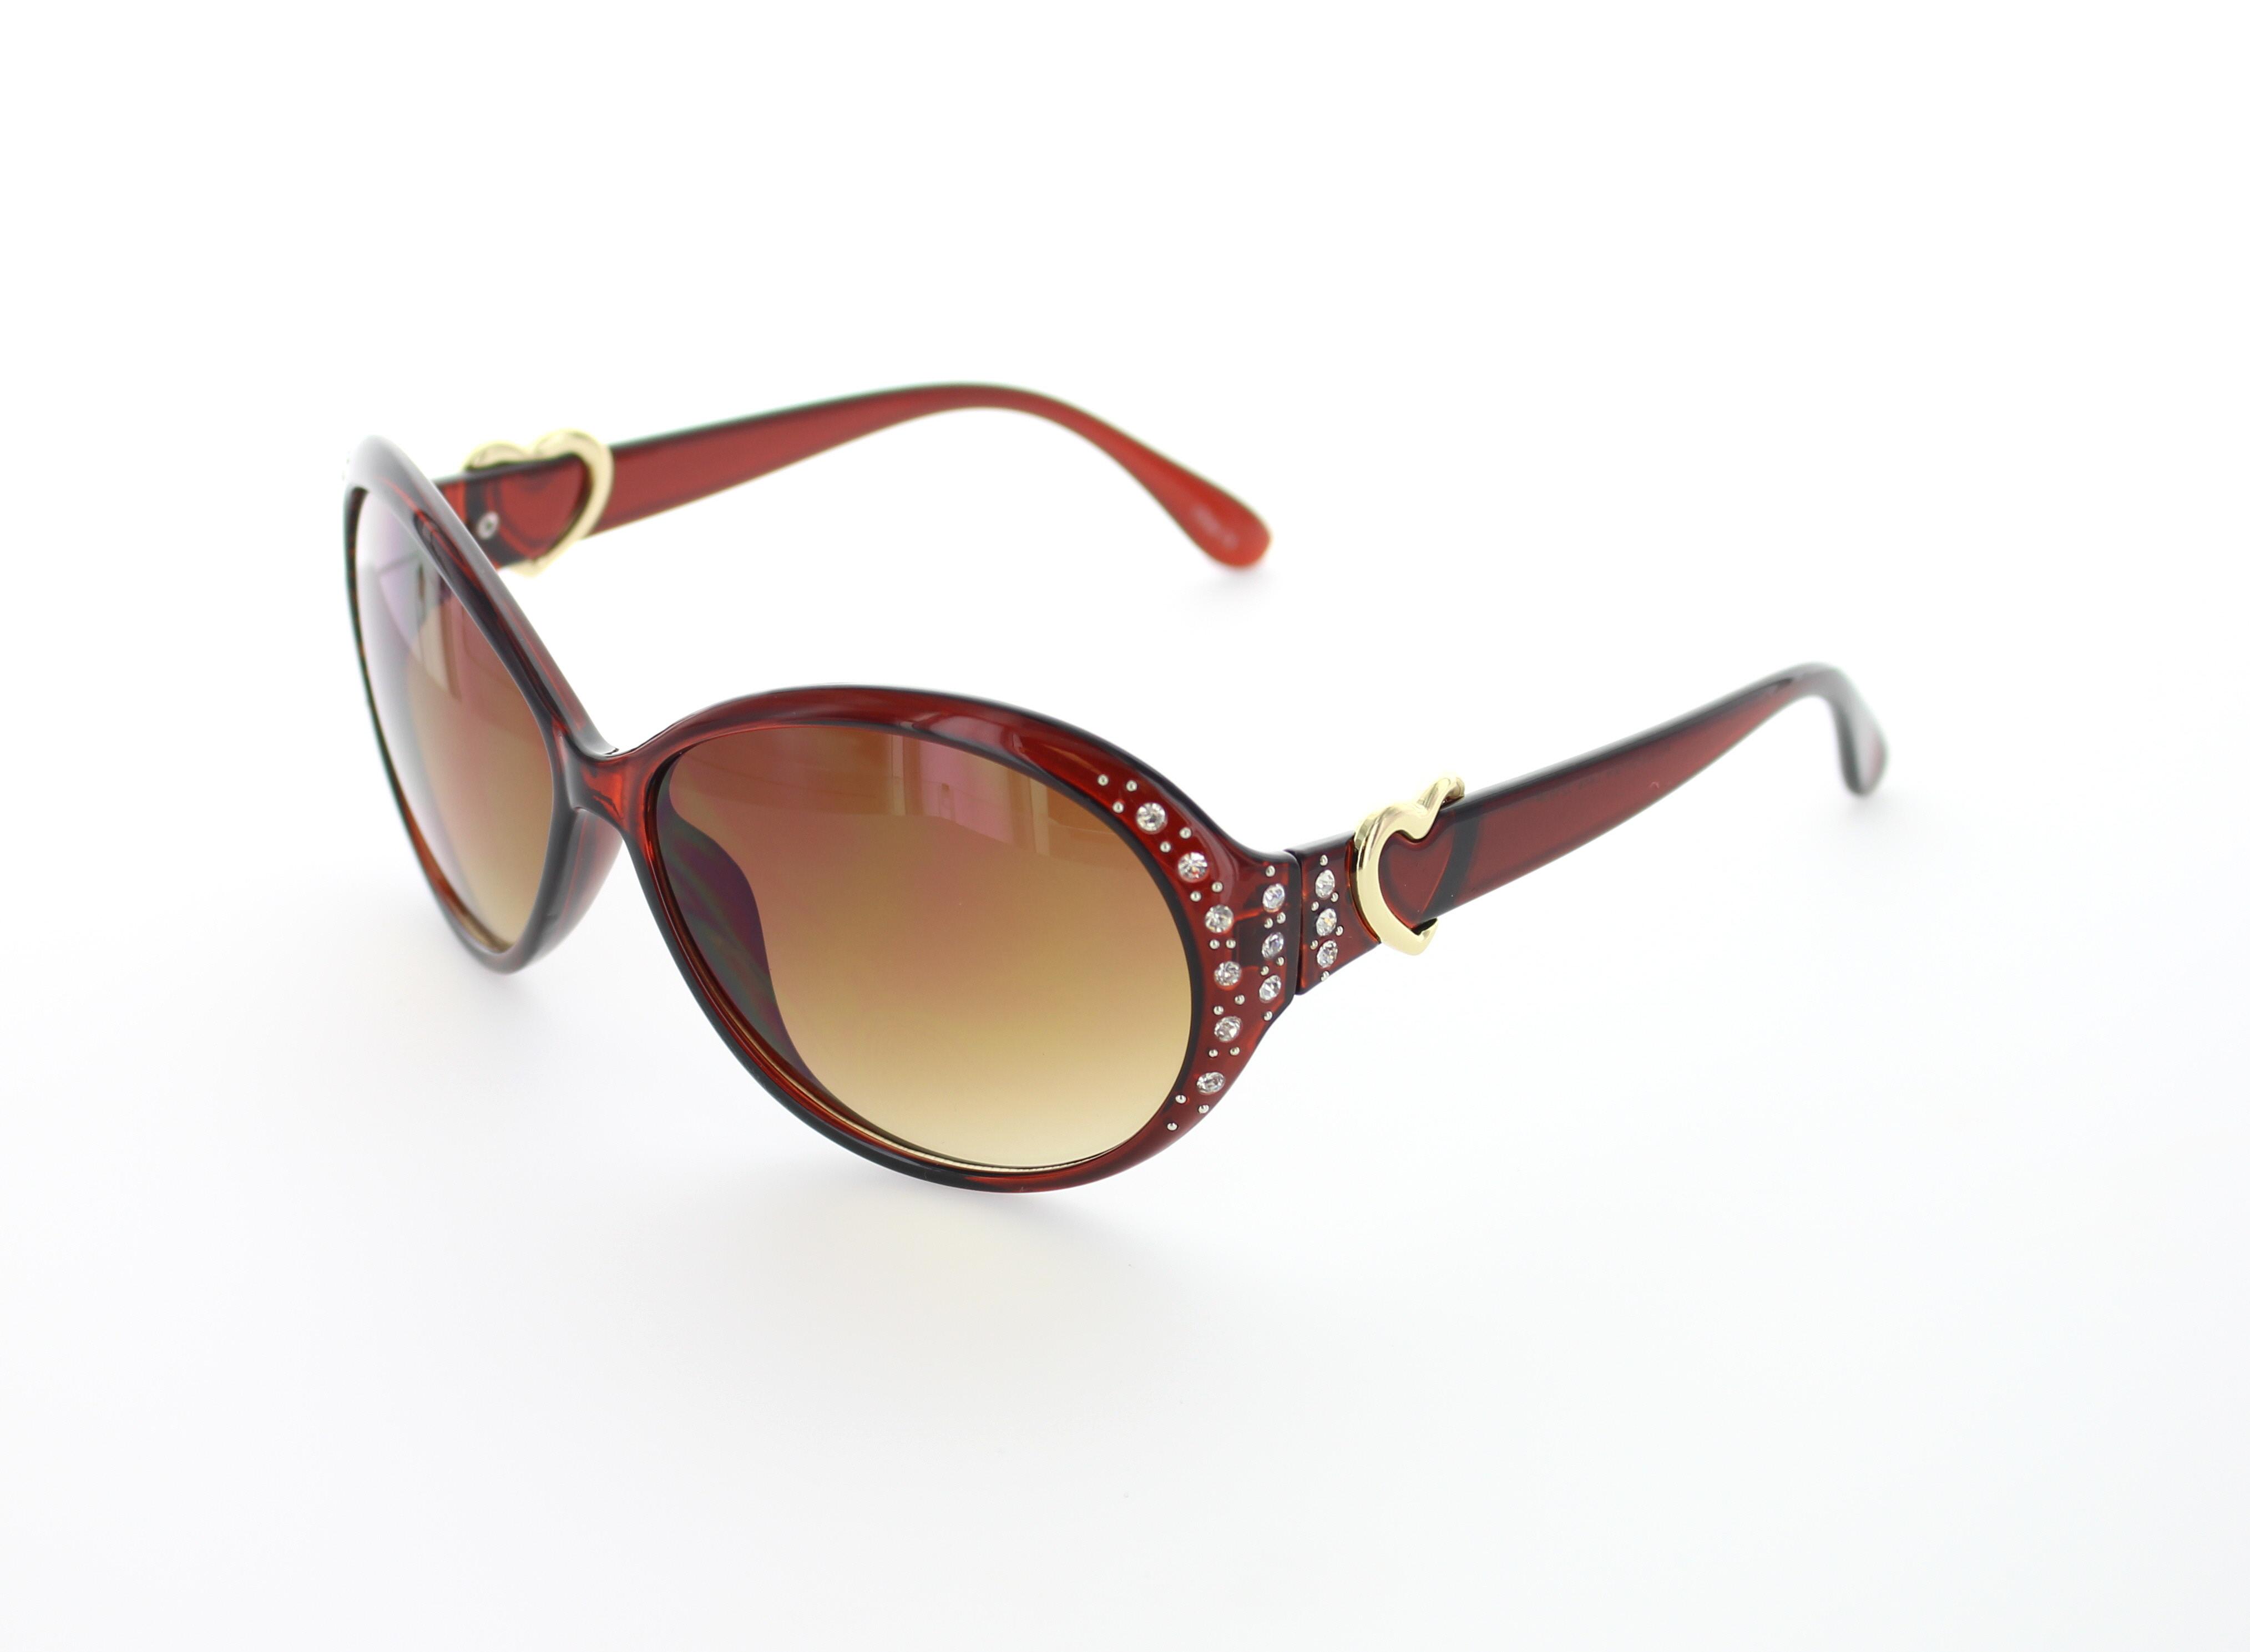 Sunglasses online shopping